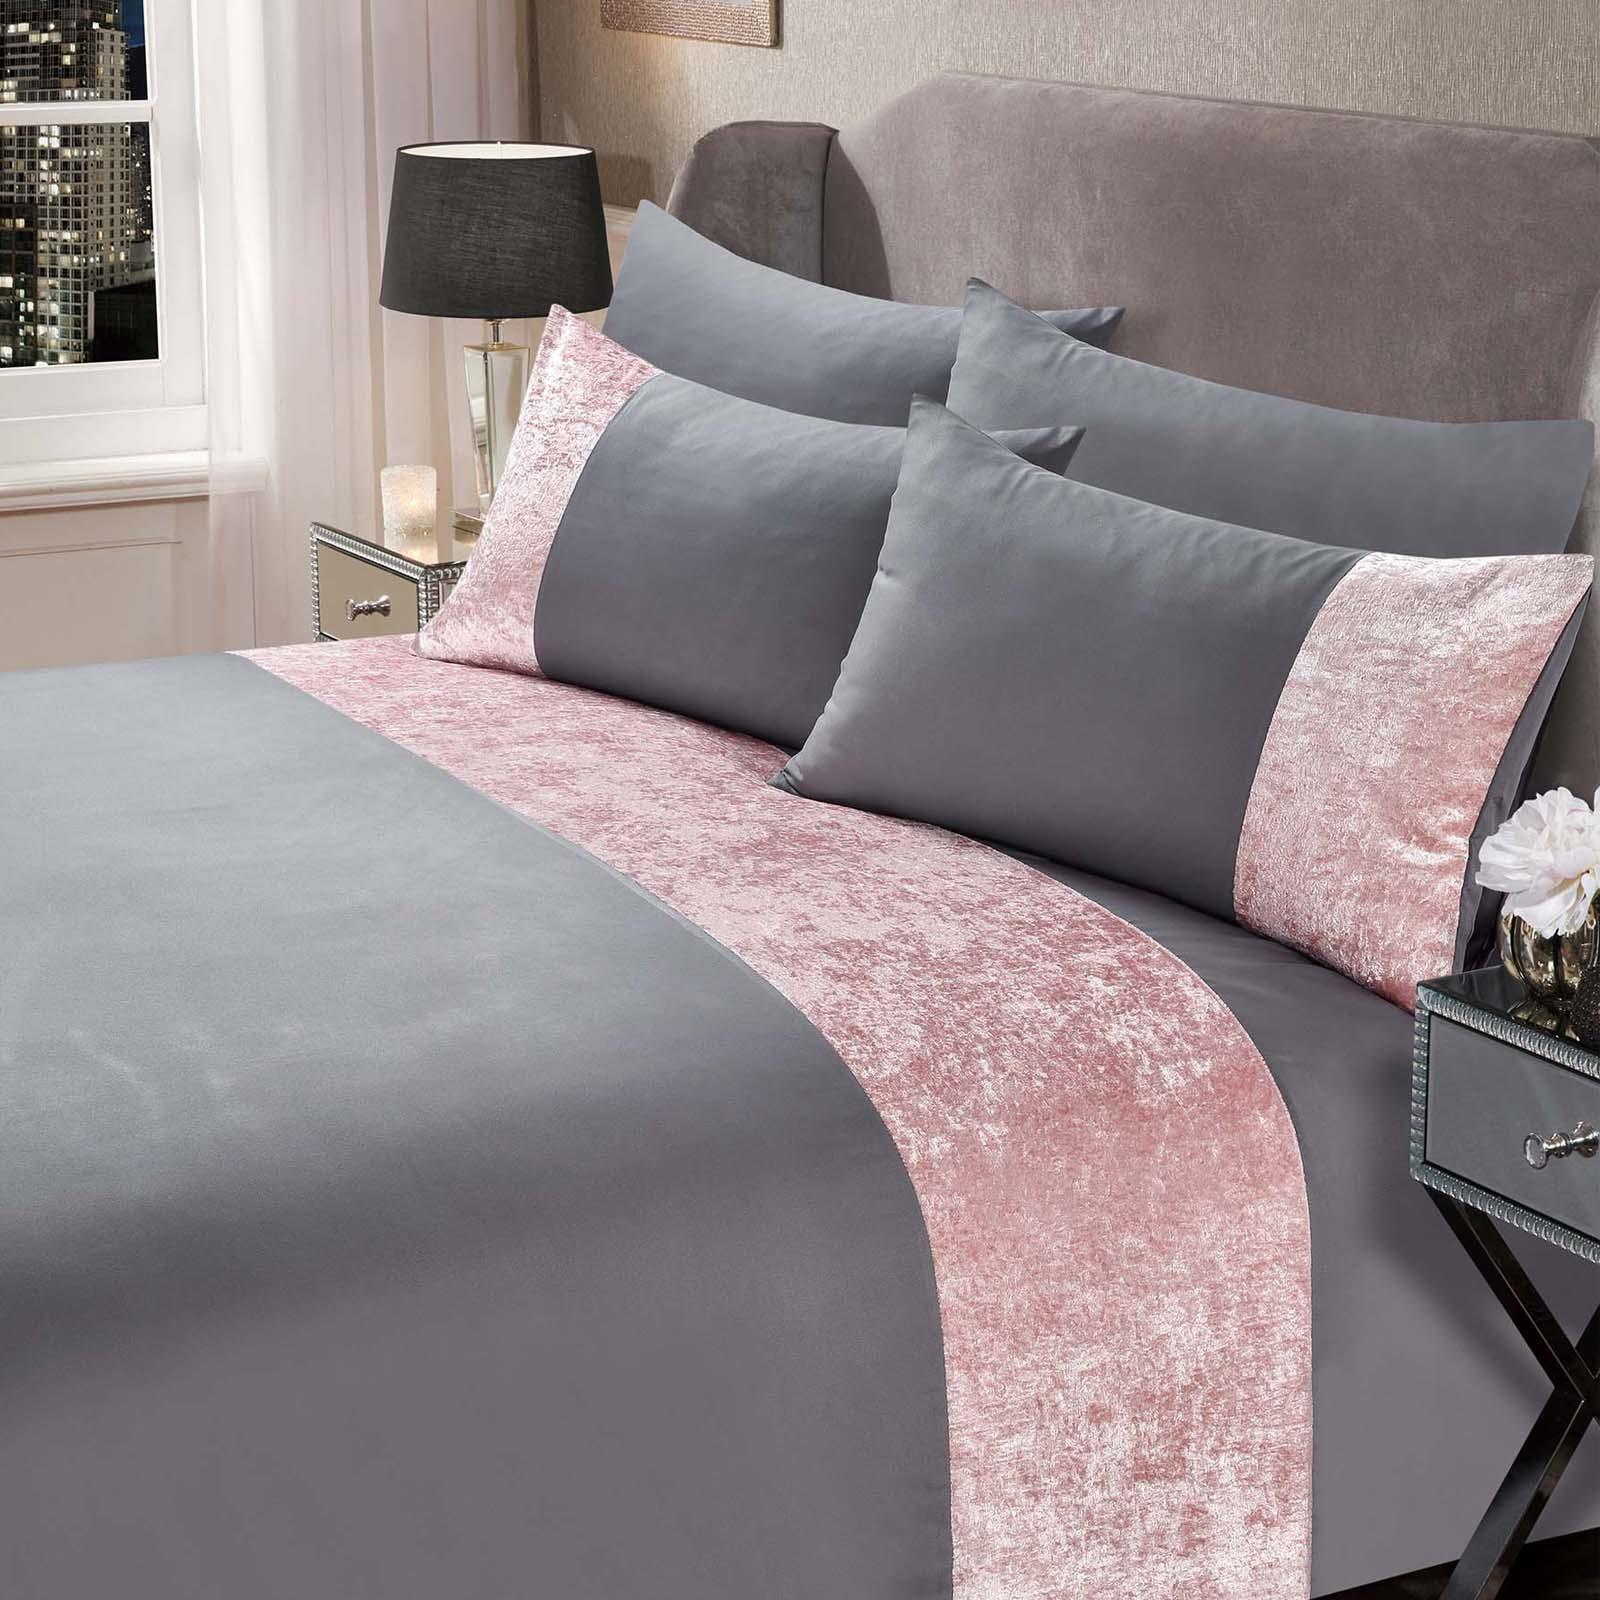 thumbnail 27 - Sienna Crushed Velvet Panel Duvet Cover with Pillow Case Bedding Set Silver Grey